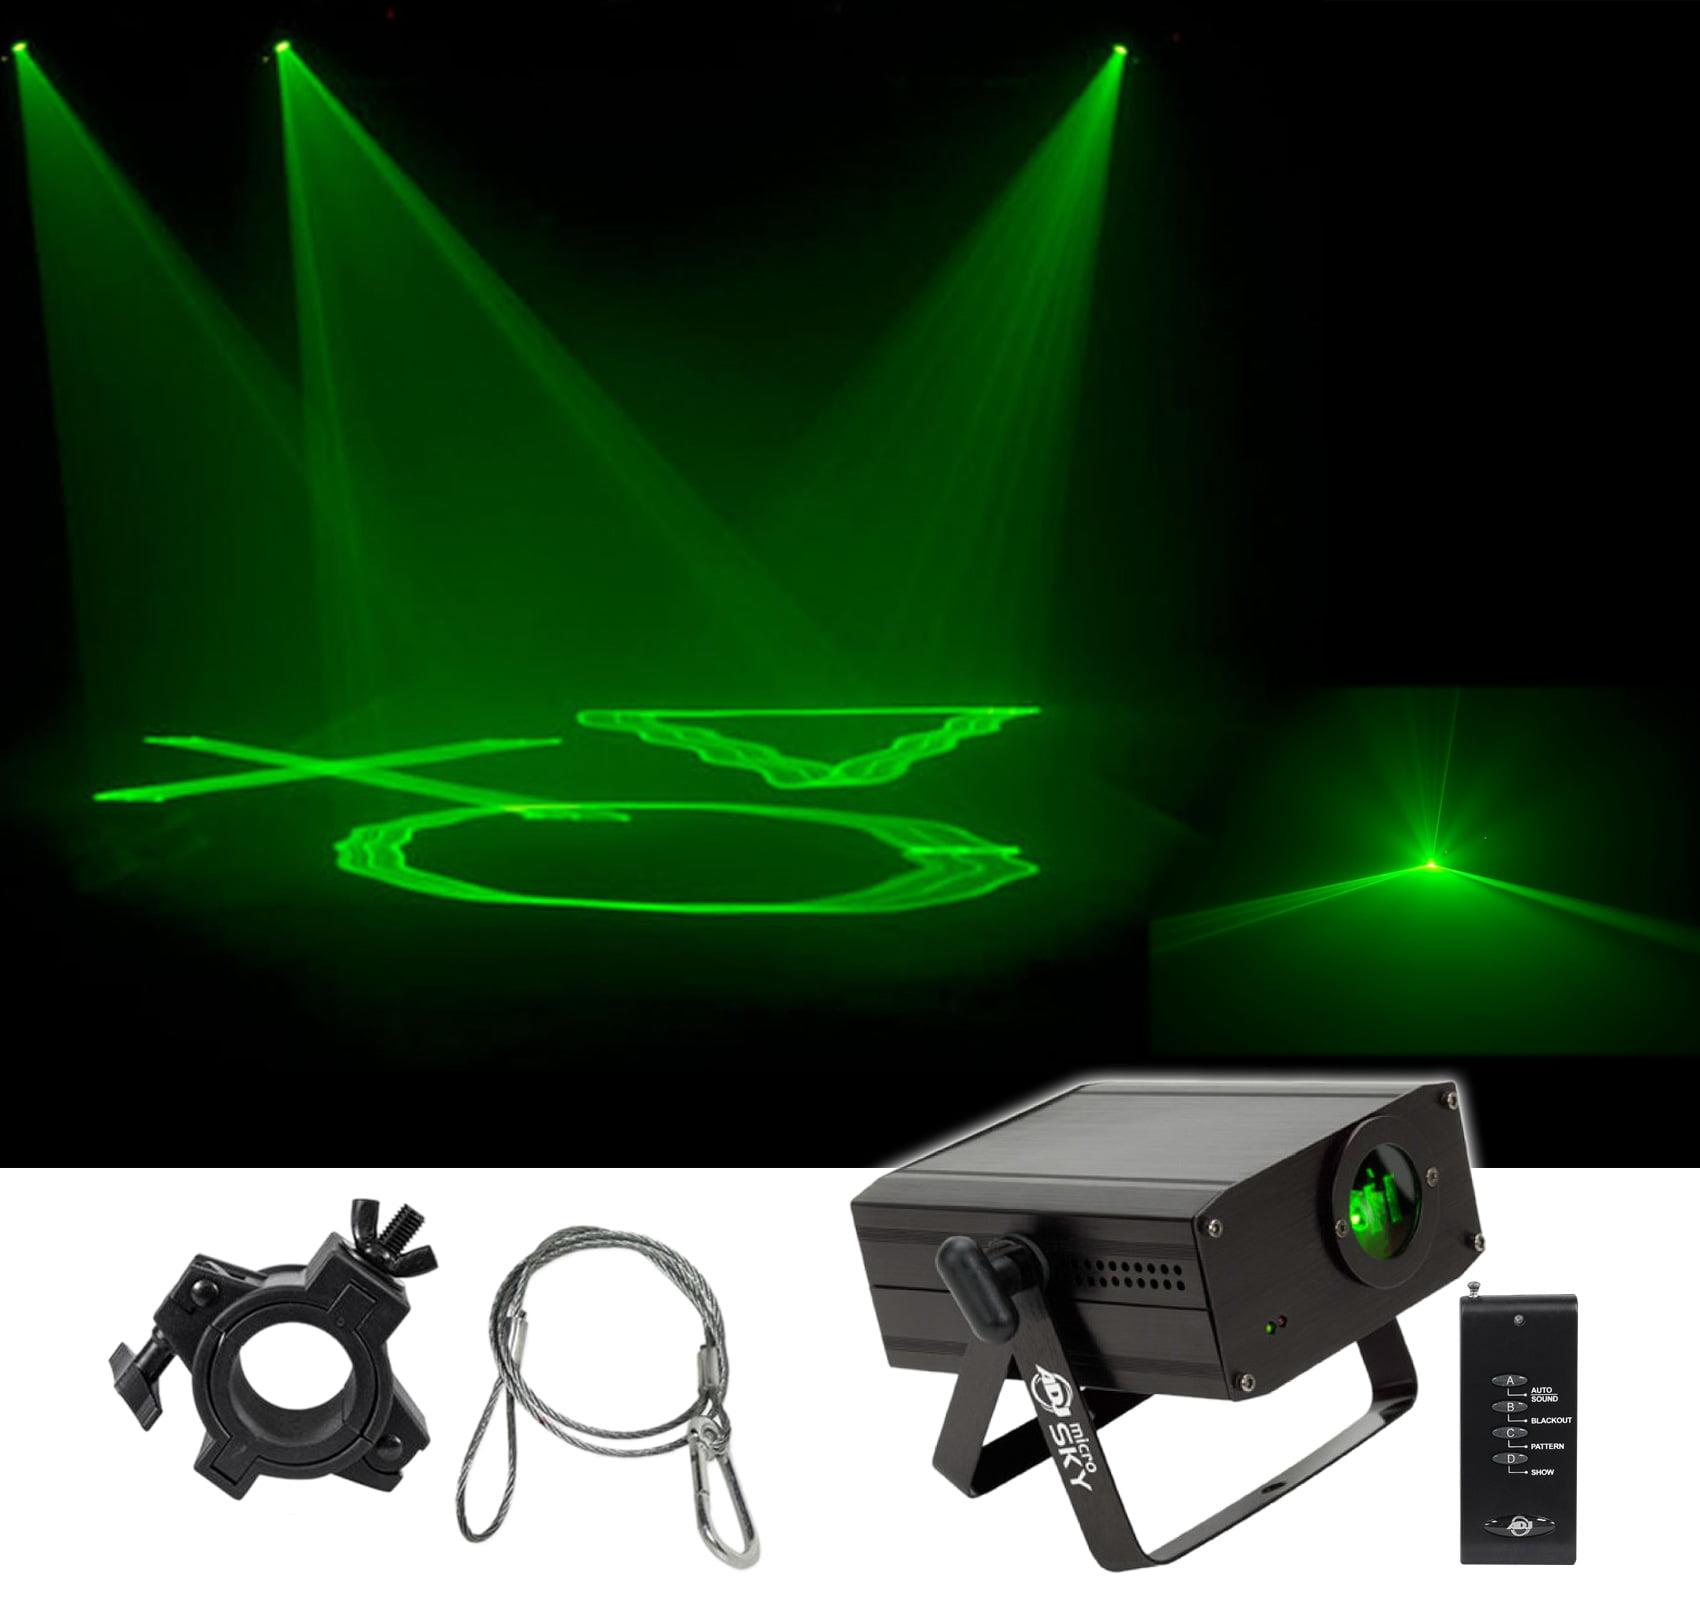 American DJ MICRO SKY Mini Green Laser w/Liquid Sky Effect Light +Clamp/Security